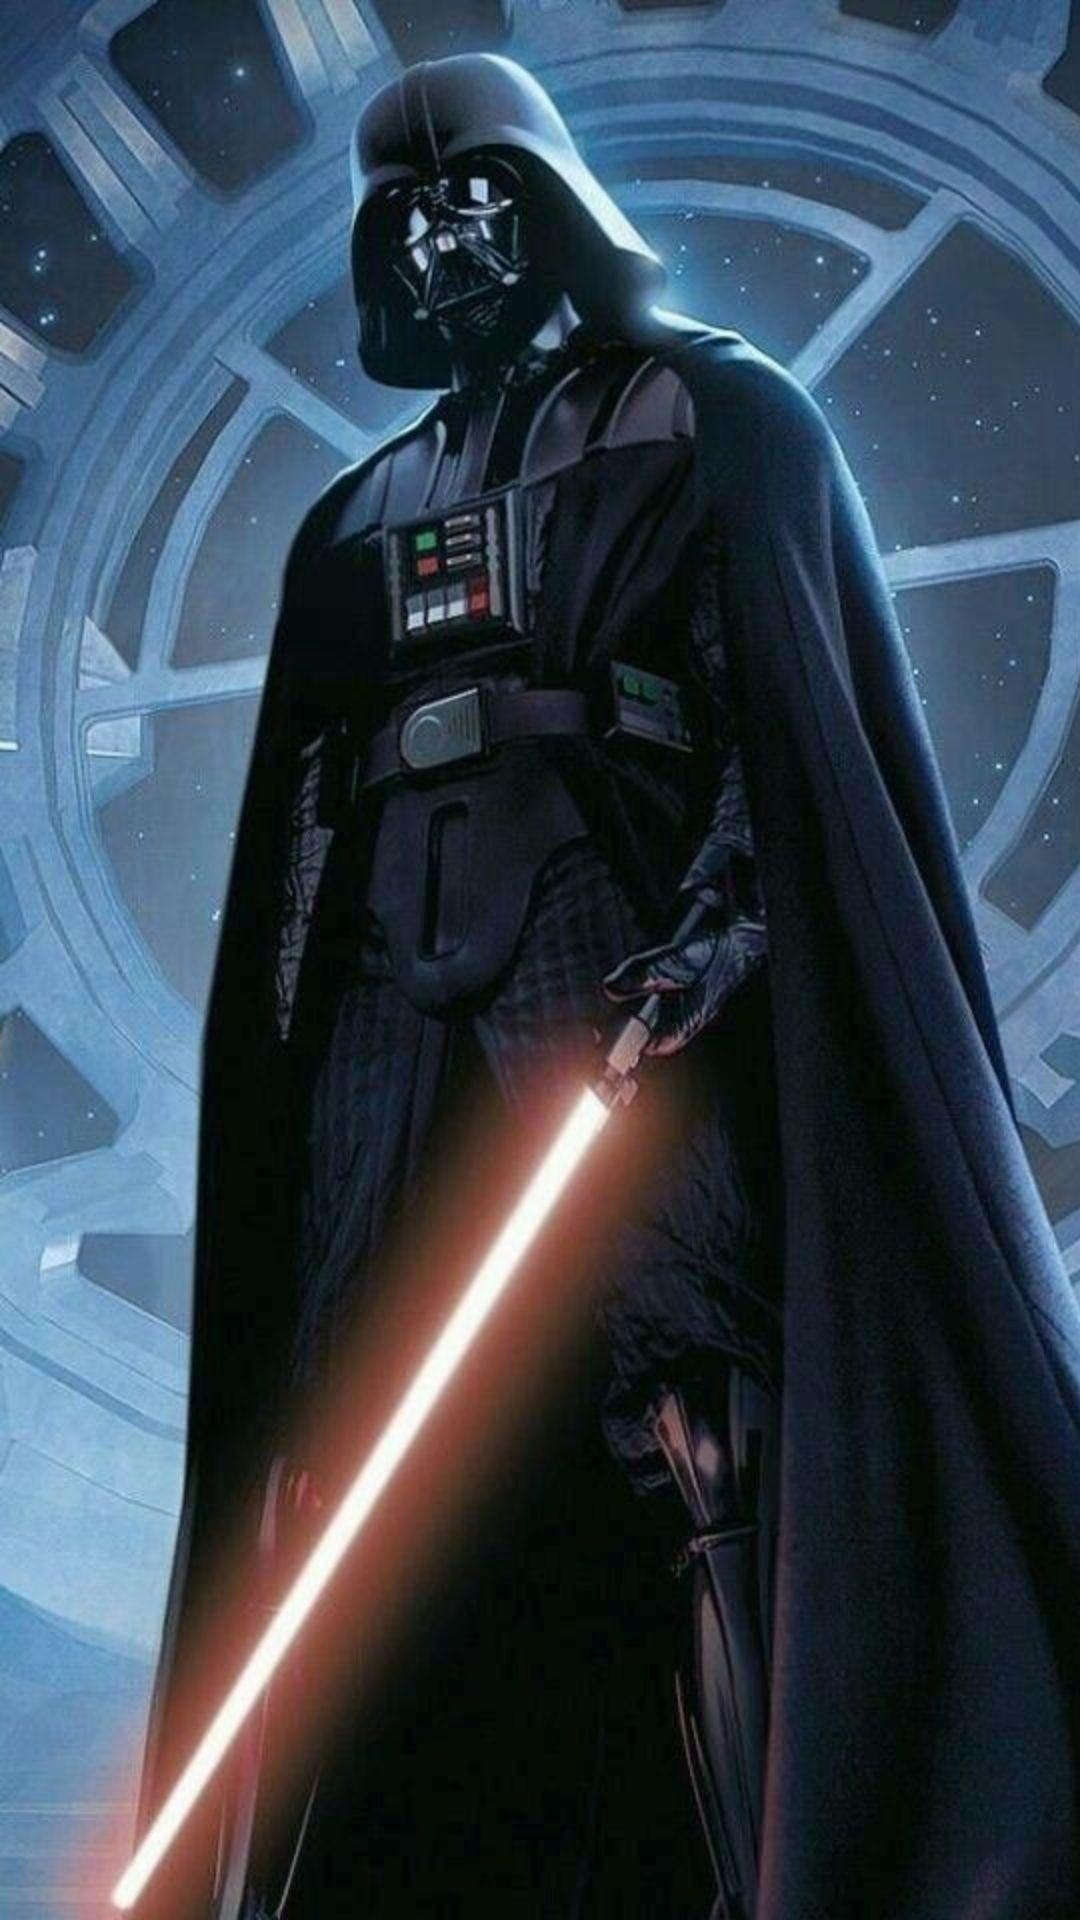 Darth Vader Star Wars Battlefront Phone Wallpaper In 2020 Star Wars Darth Vader Costume Vader Star Wars Darth Vader Costumes